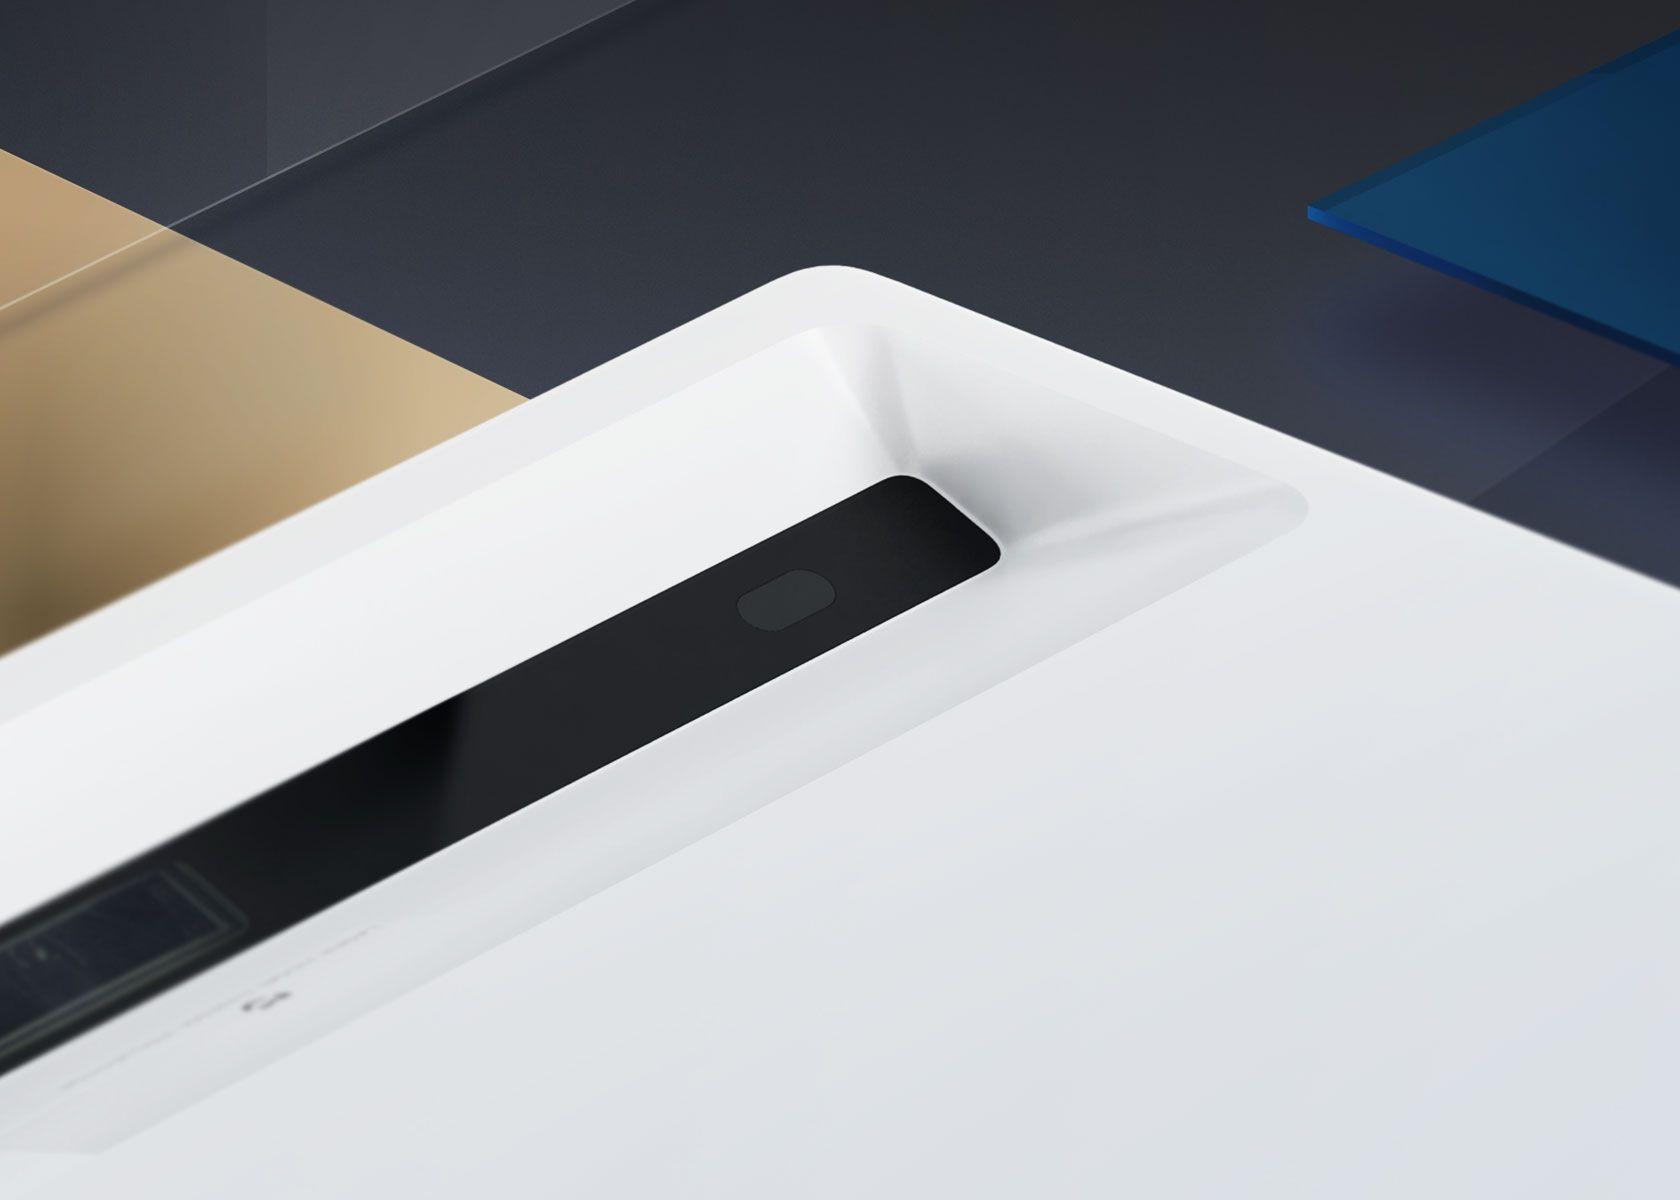 Xiaomi Mi MIJIA Laser Projector 5000 Lumens Android 6 0 ALPD